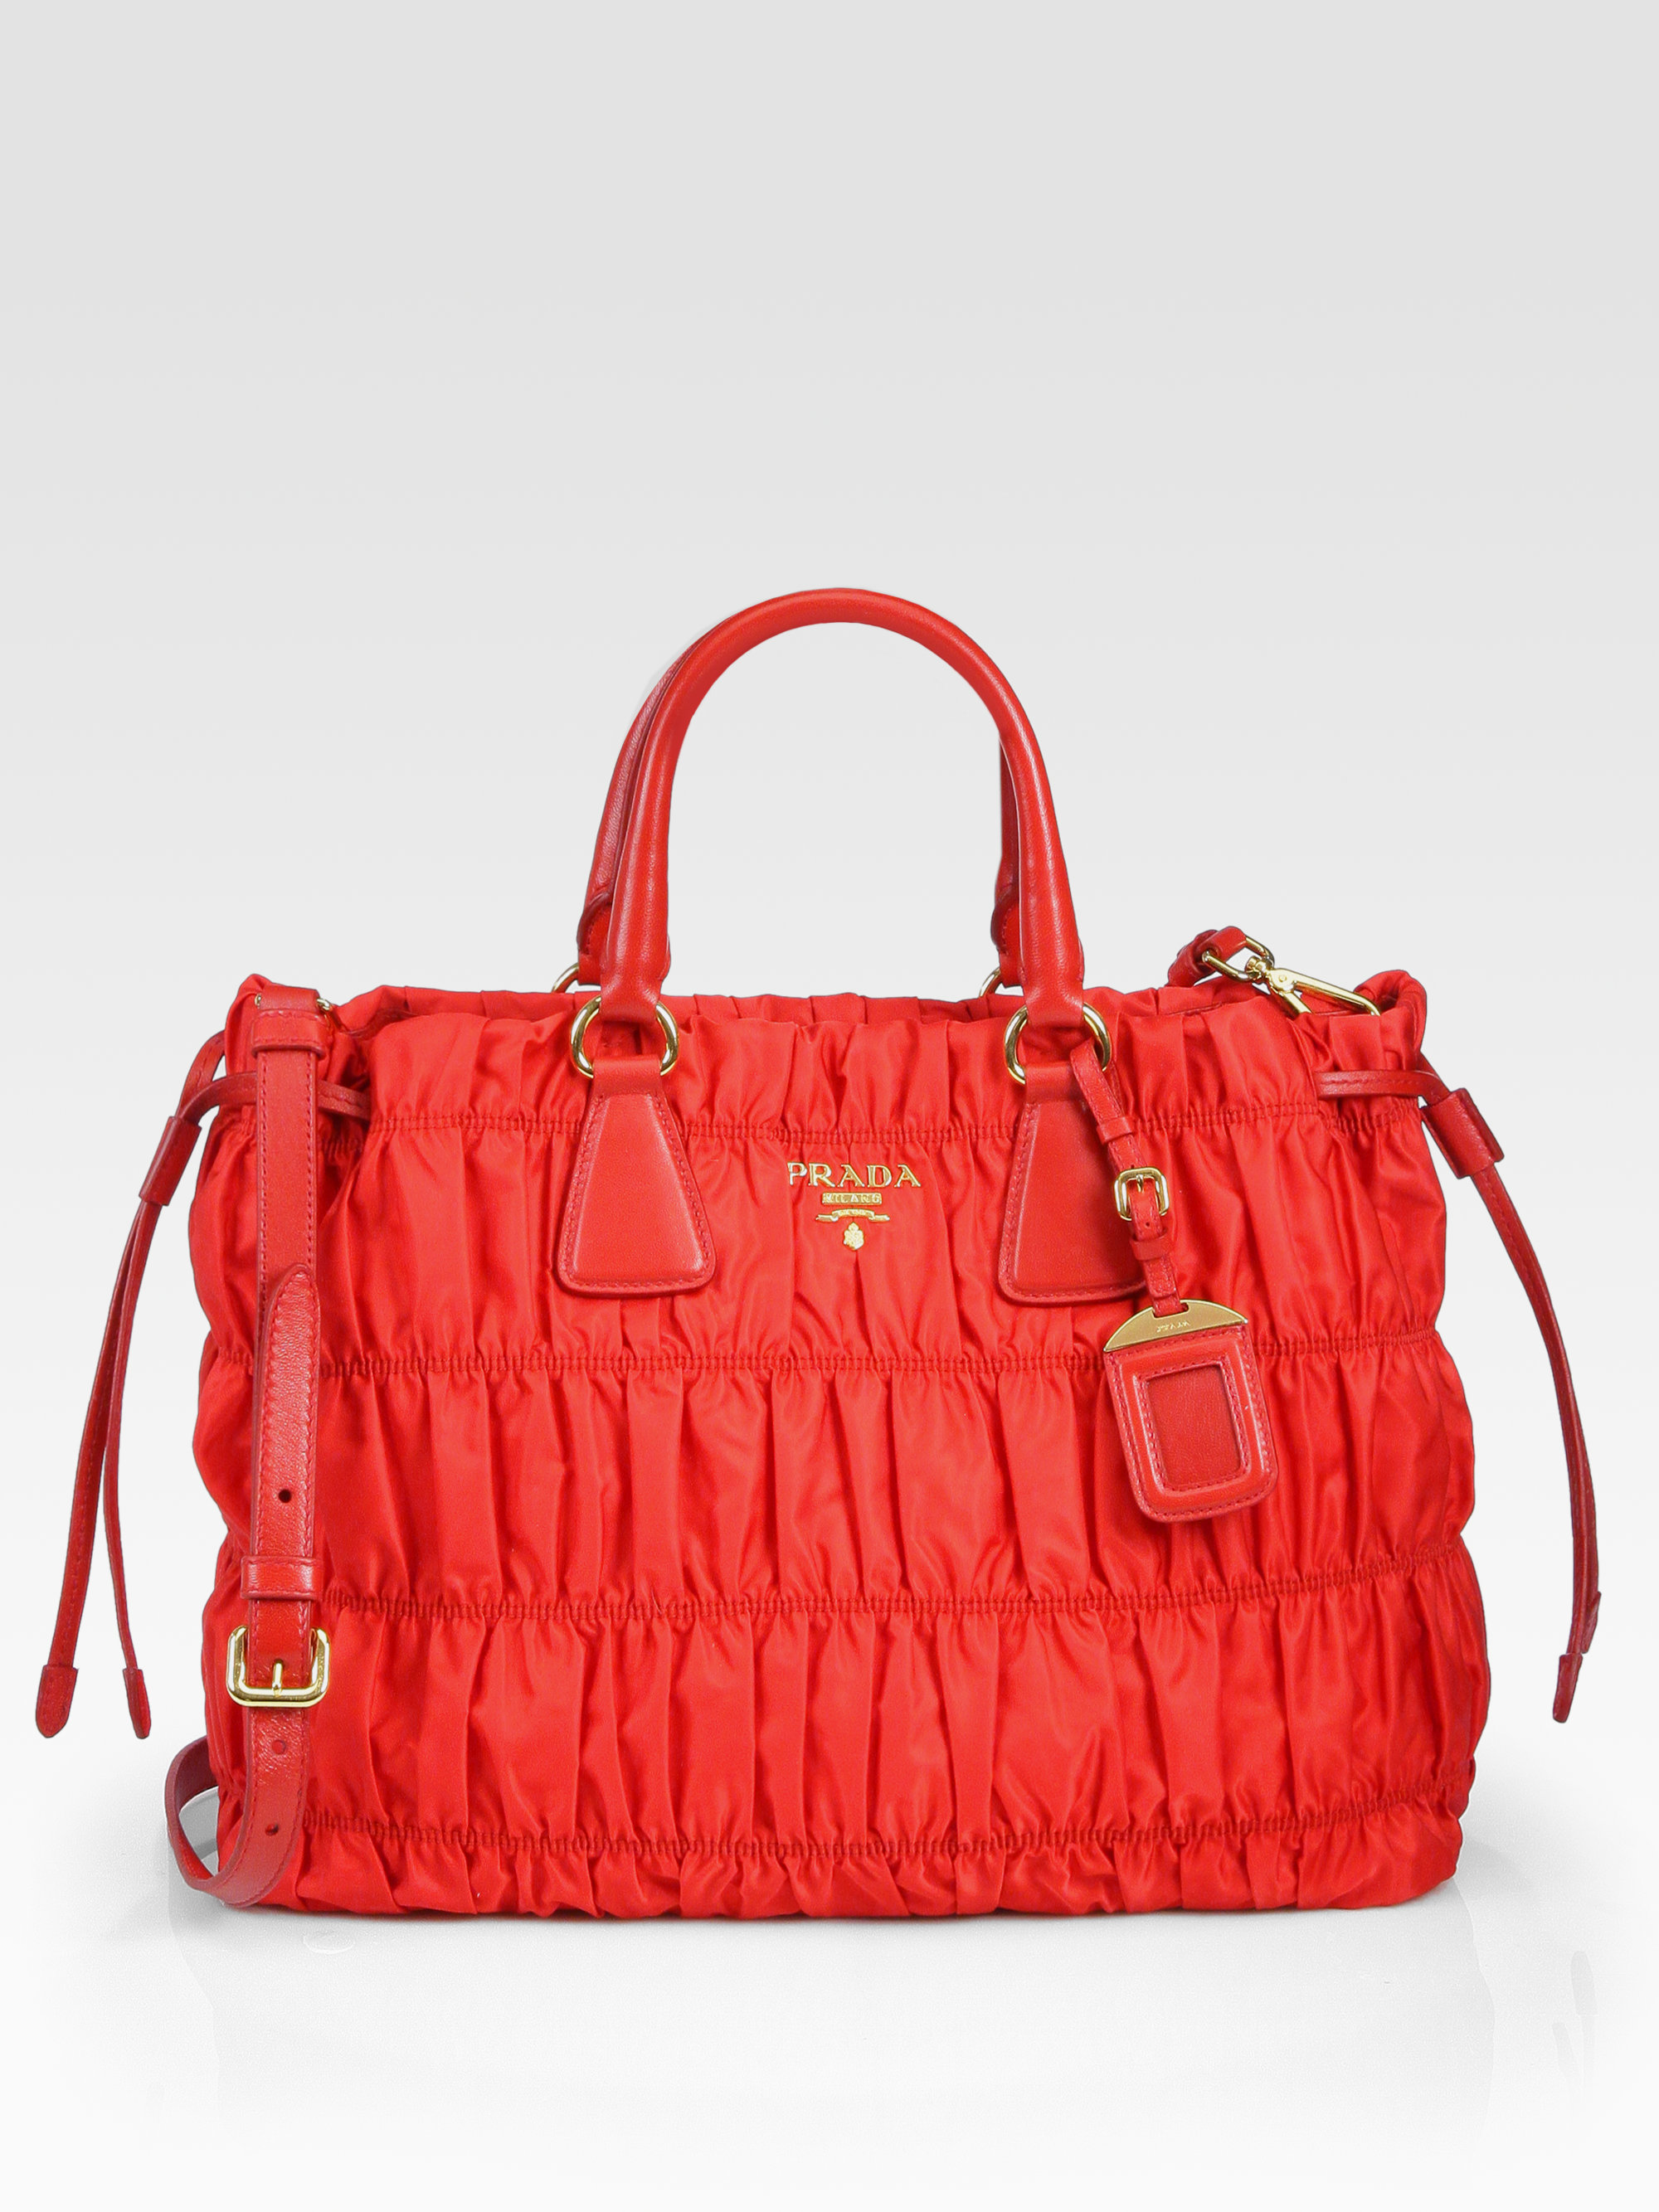 f74e270ed60b ... discount reduced lyst prada tessuto gaufre tote bag in red c9140 d34e6  c8320 c7aa2